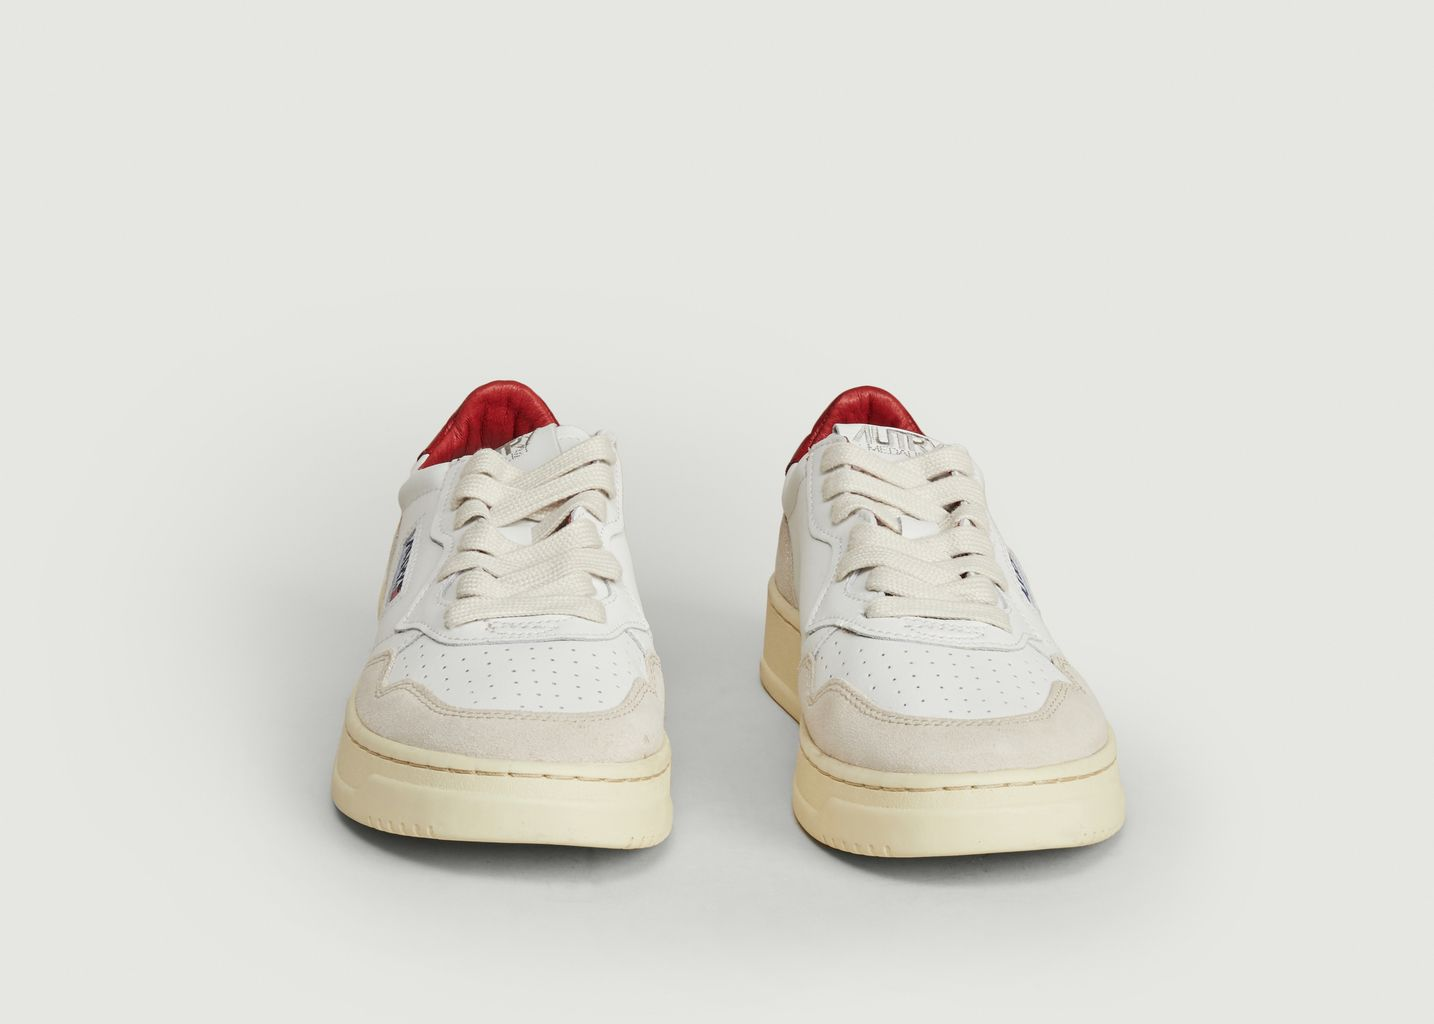 Sneakers Medalist - AUTRY